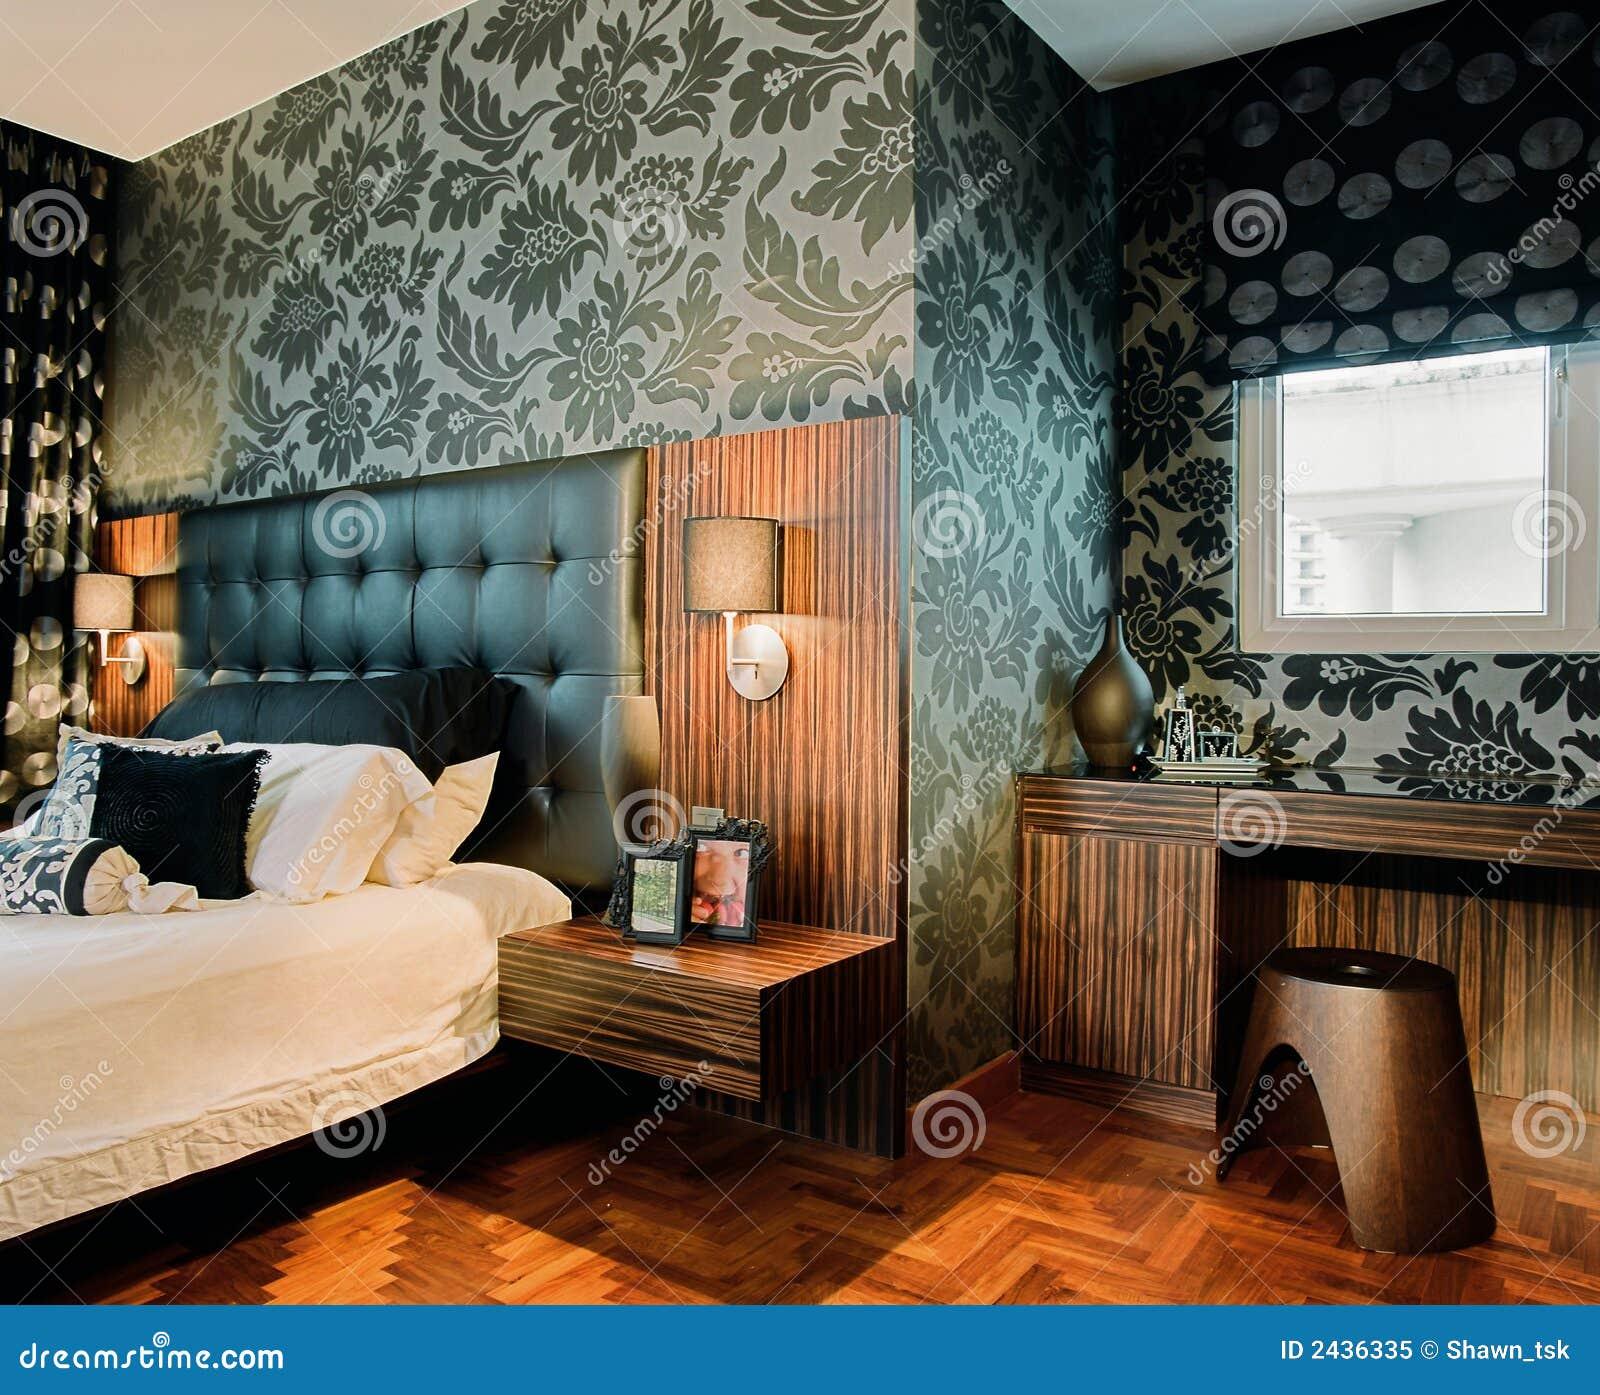 Interior Design Bedroom Stock Image Image Of Light